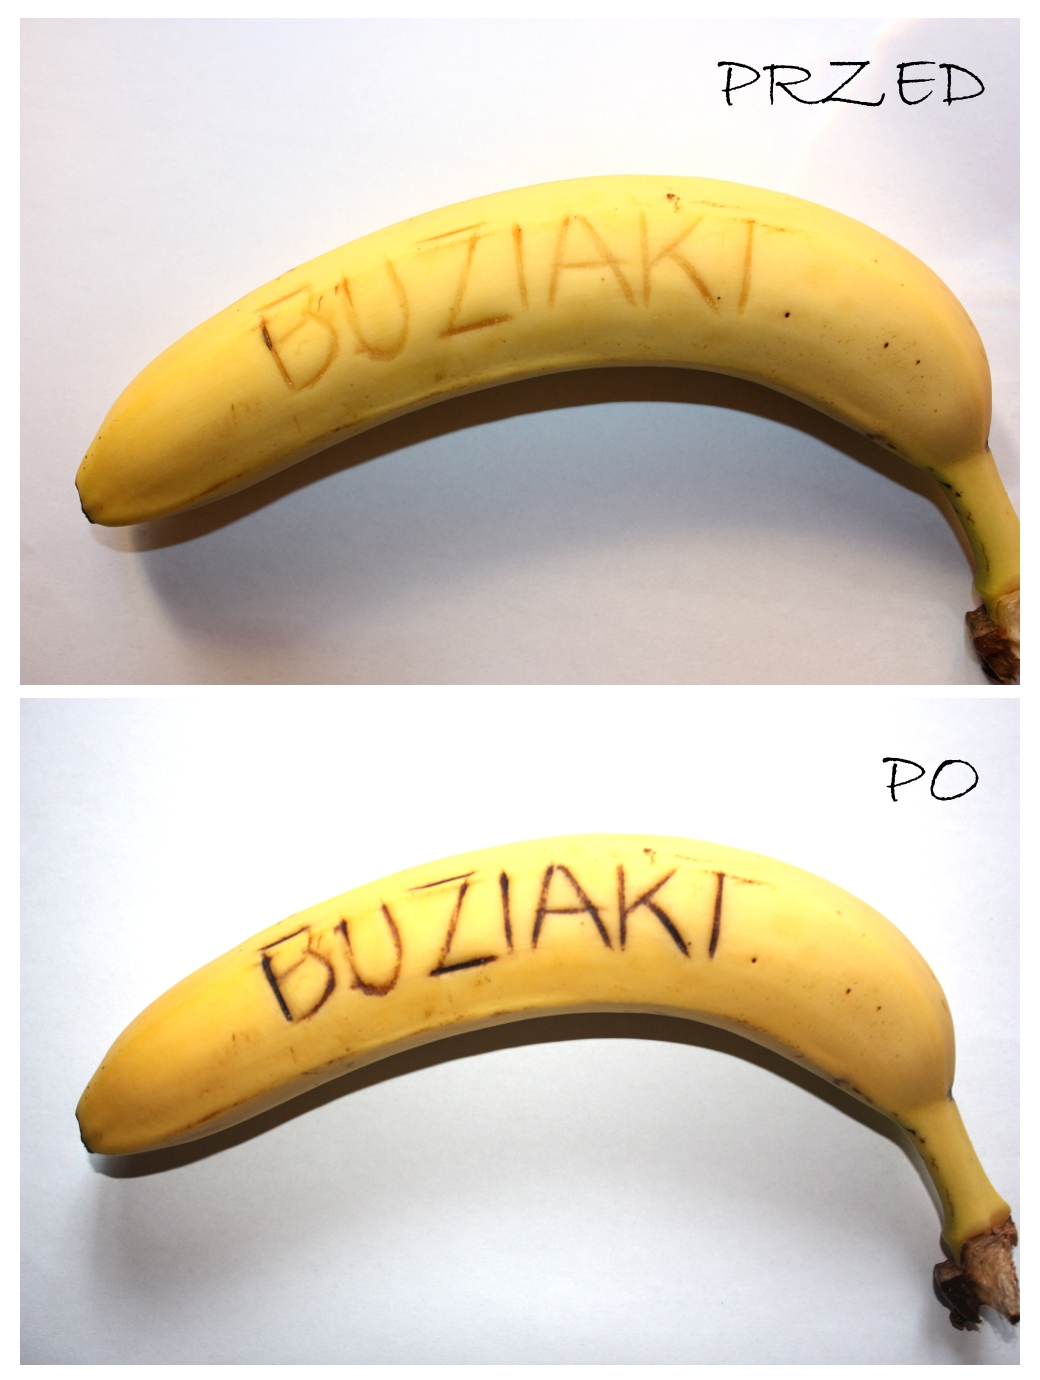 Liściki na bananach